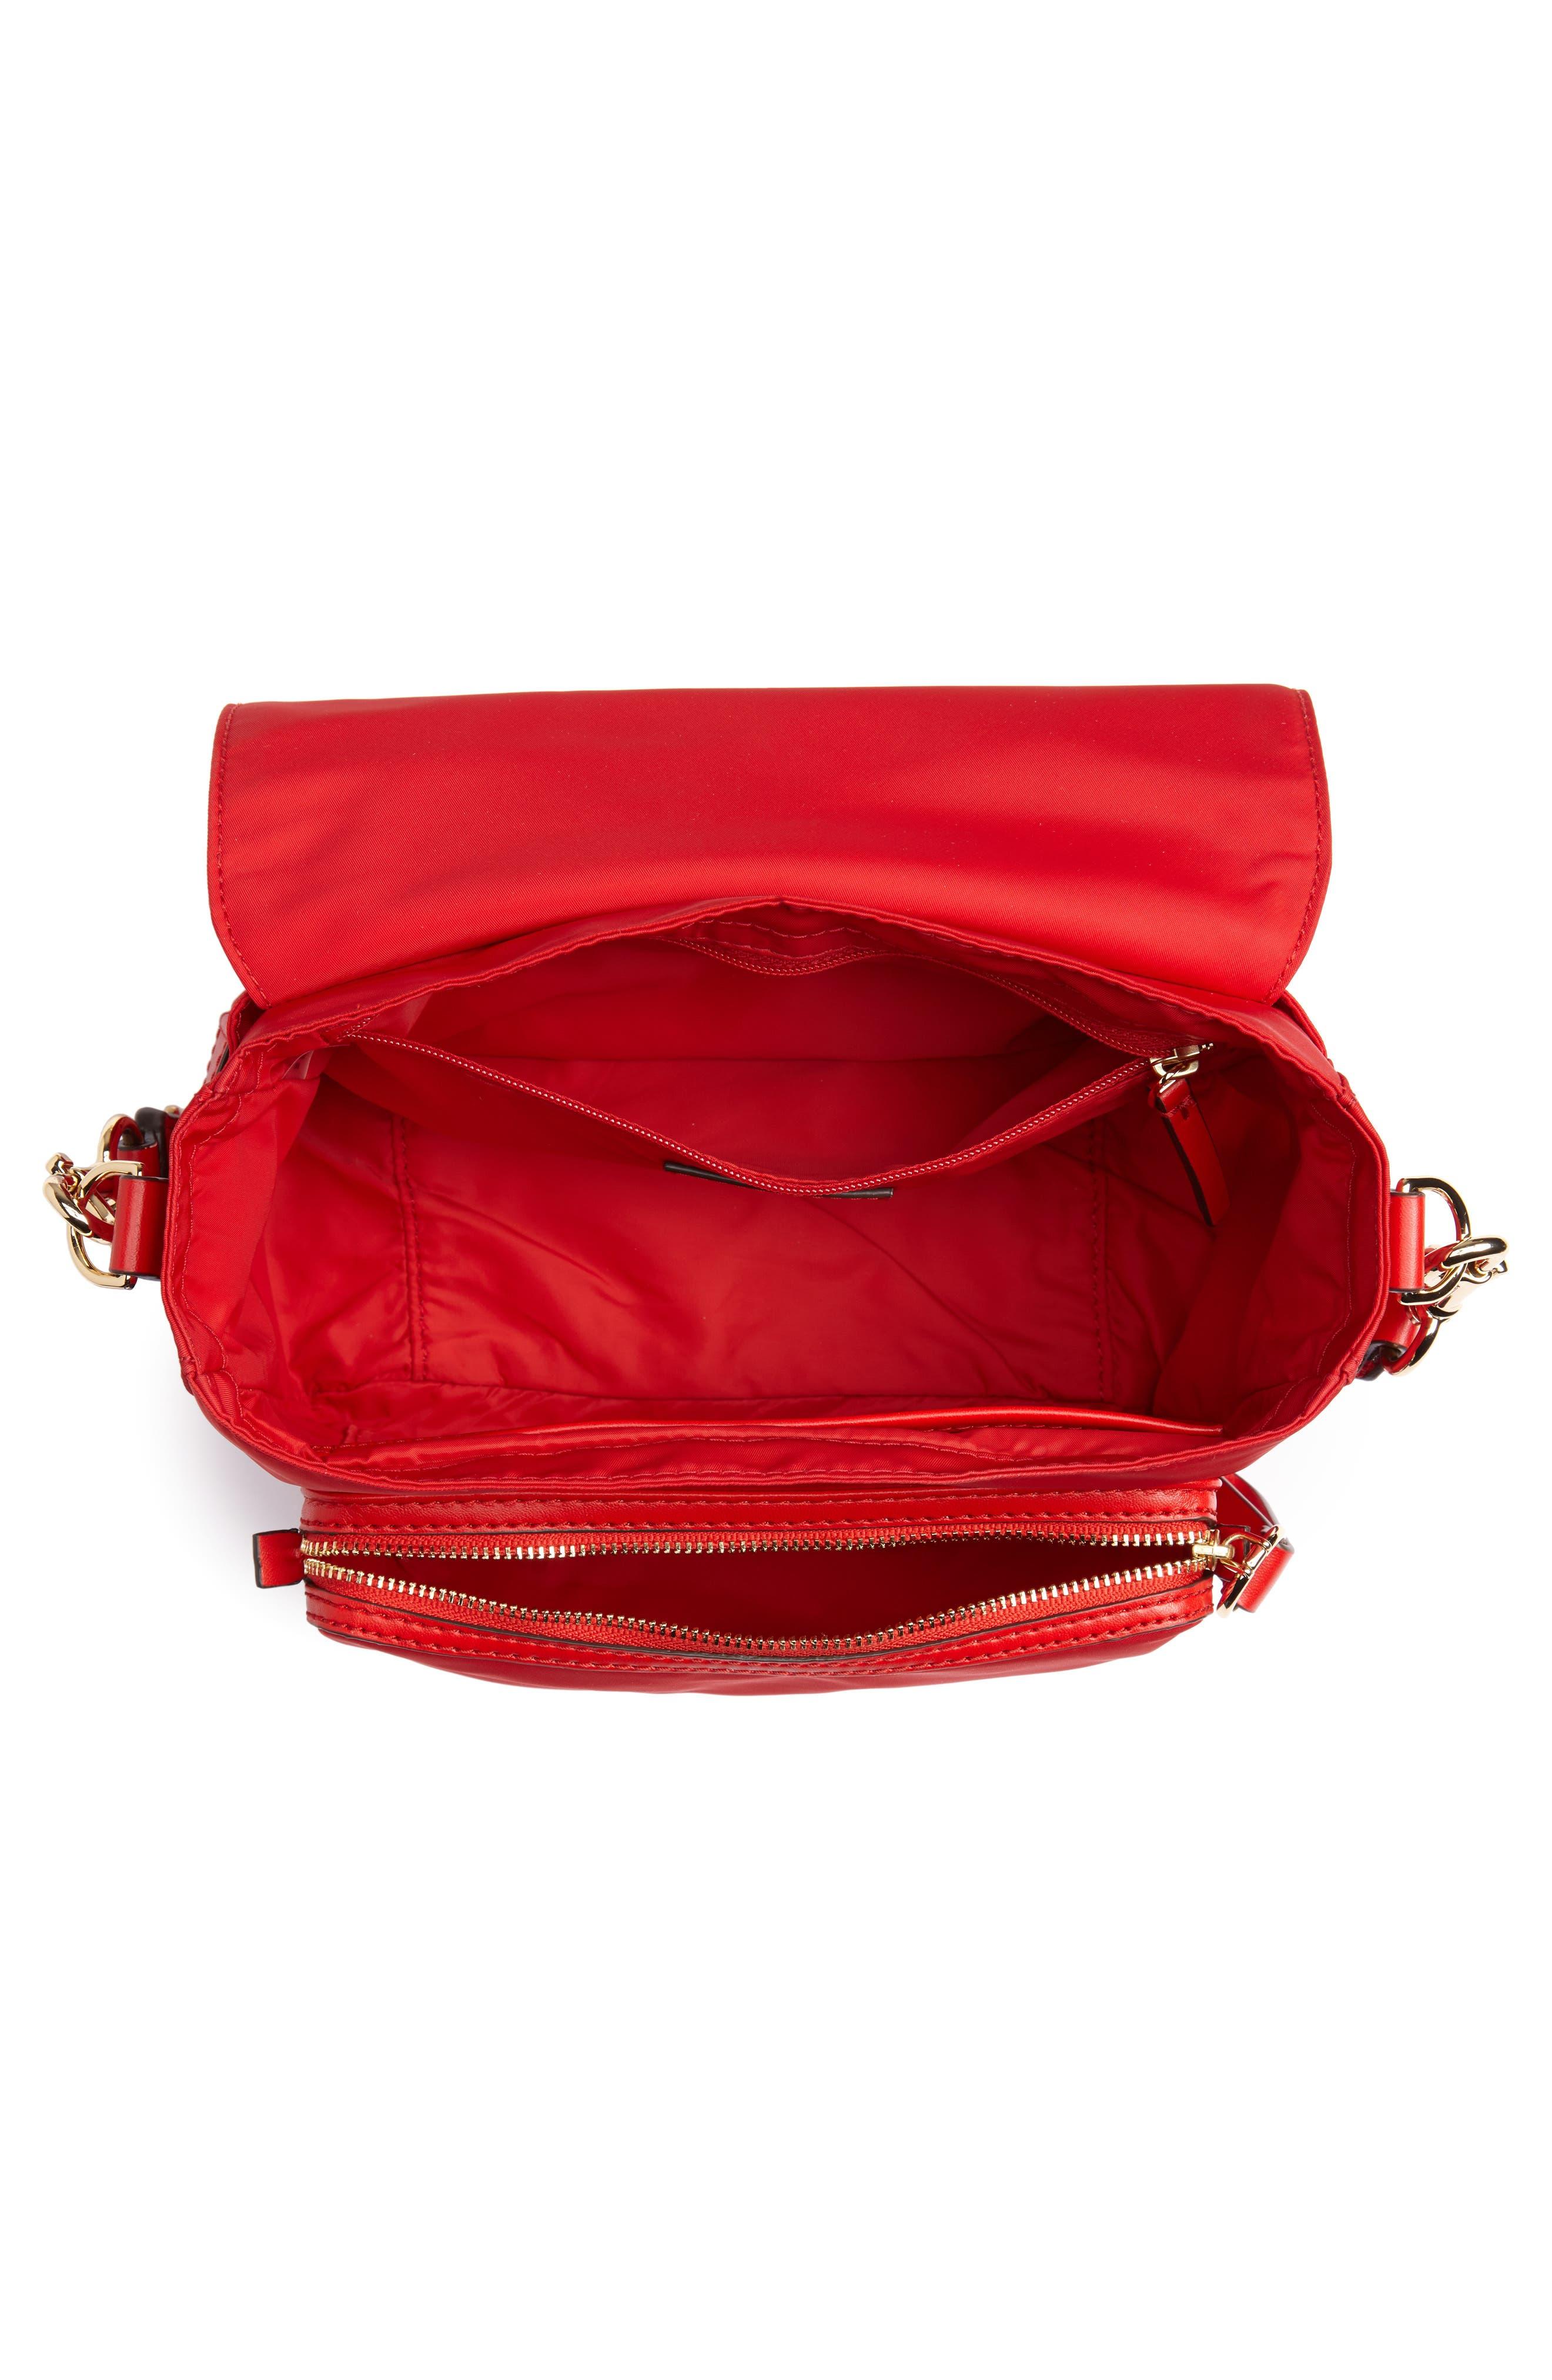 Tilda Nylon Crossbody Bag,                             Alternate thumbnail 5, color,                             BRILLIANT RED